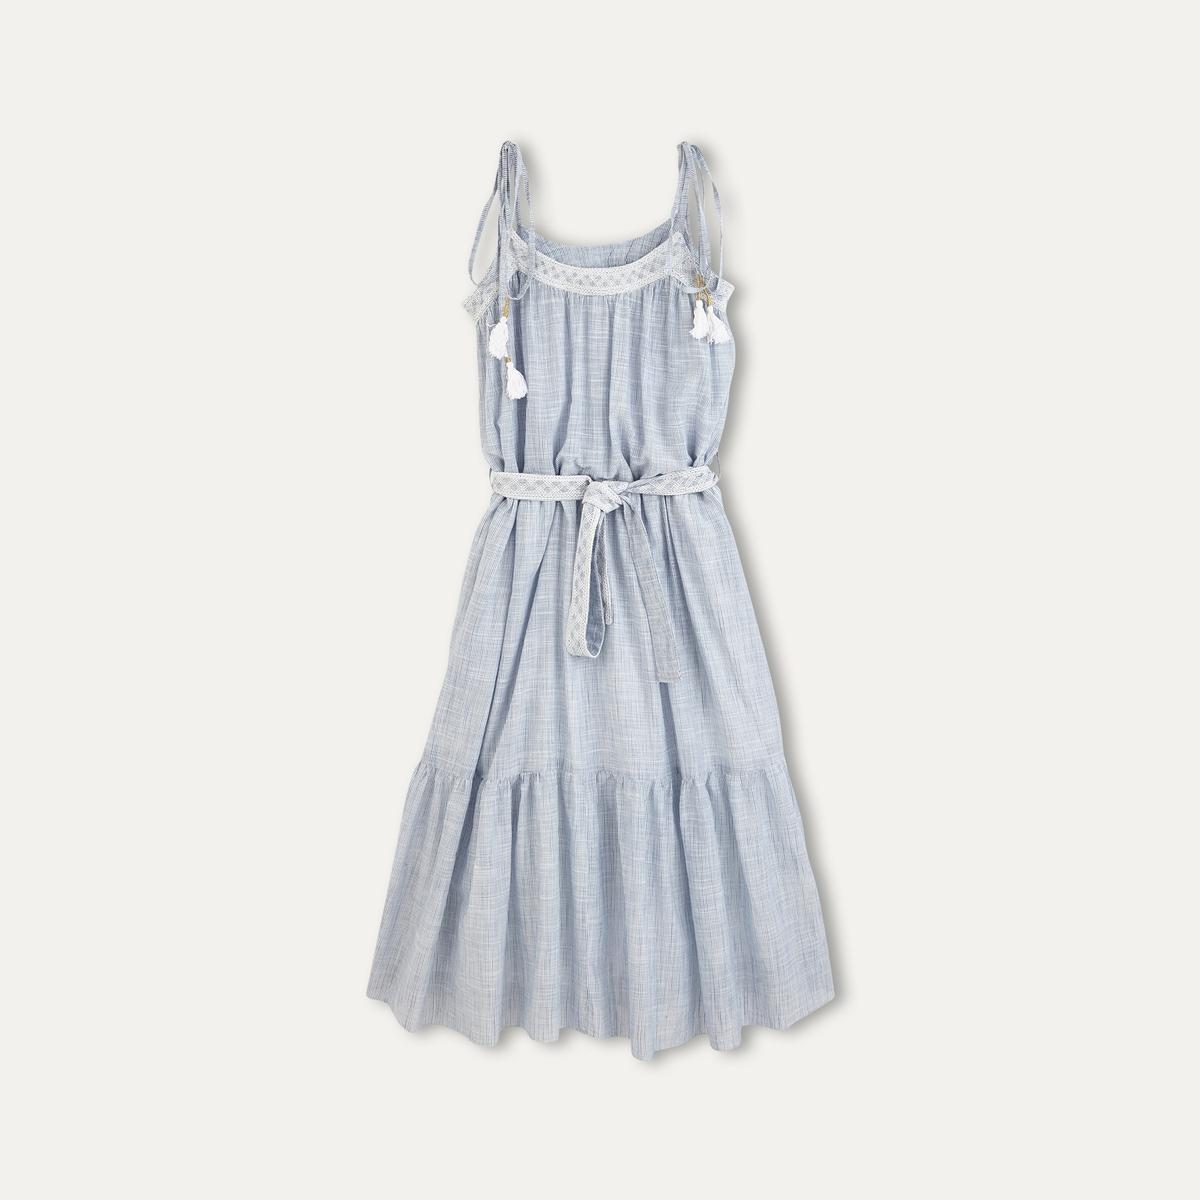 Платье REINE от LEON and HARPER